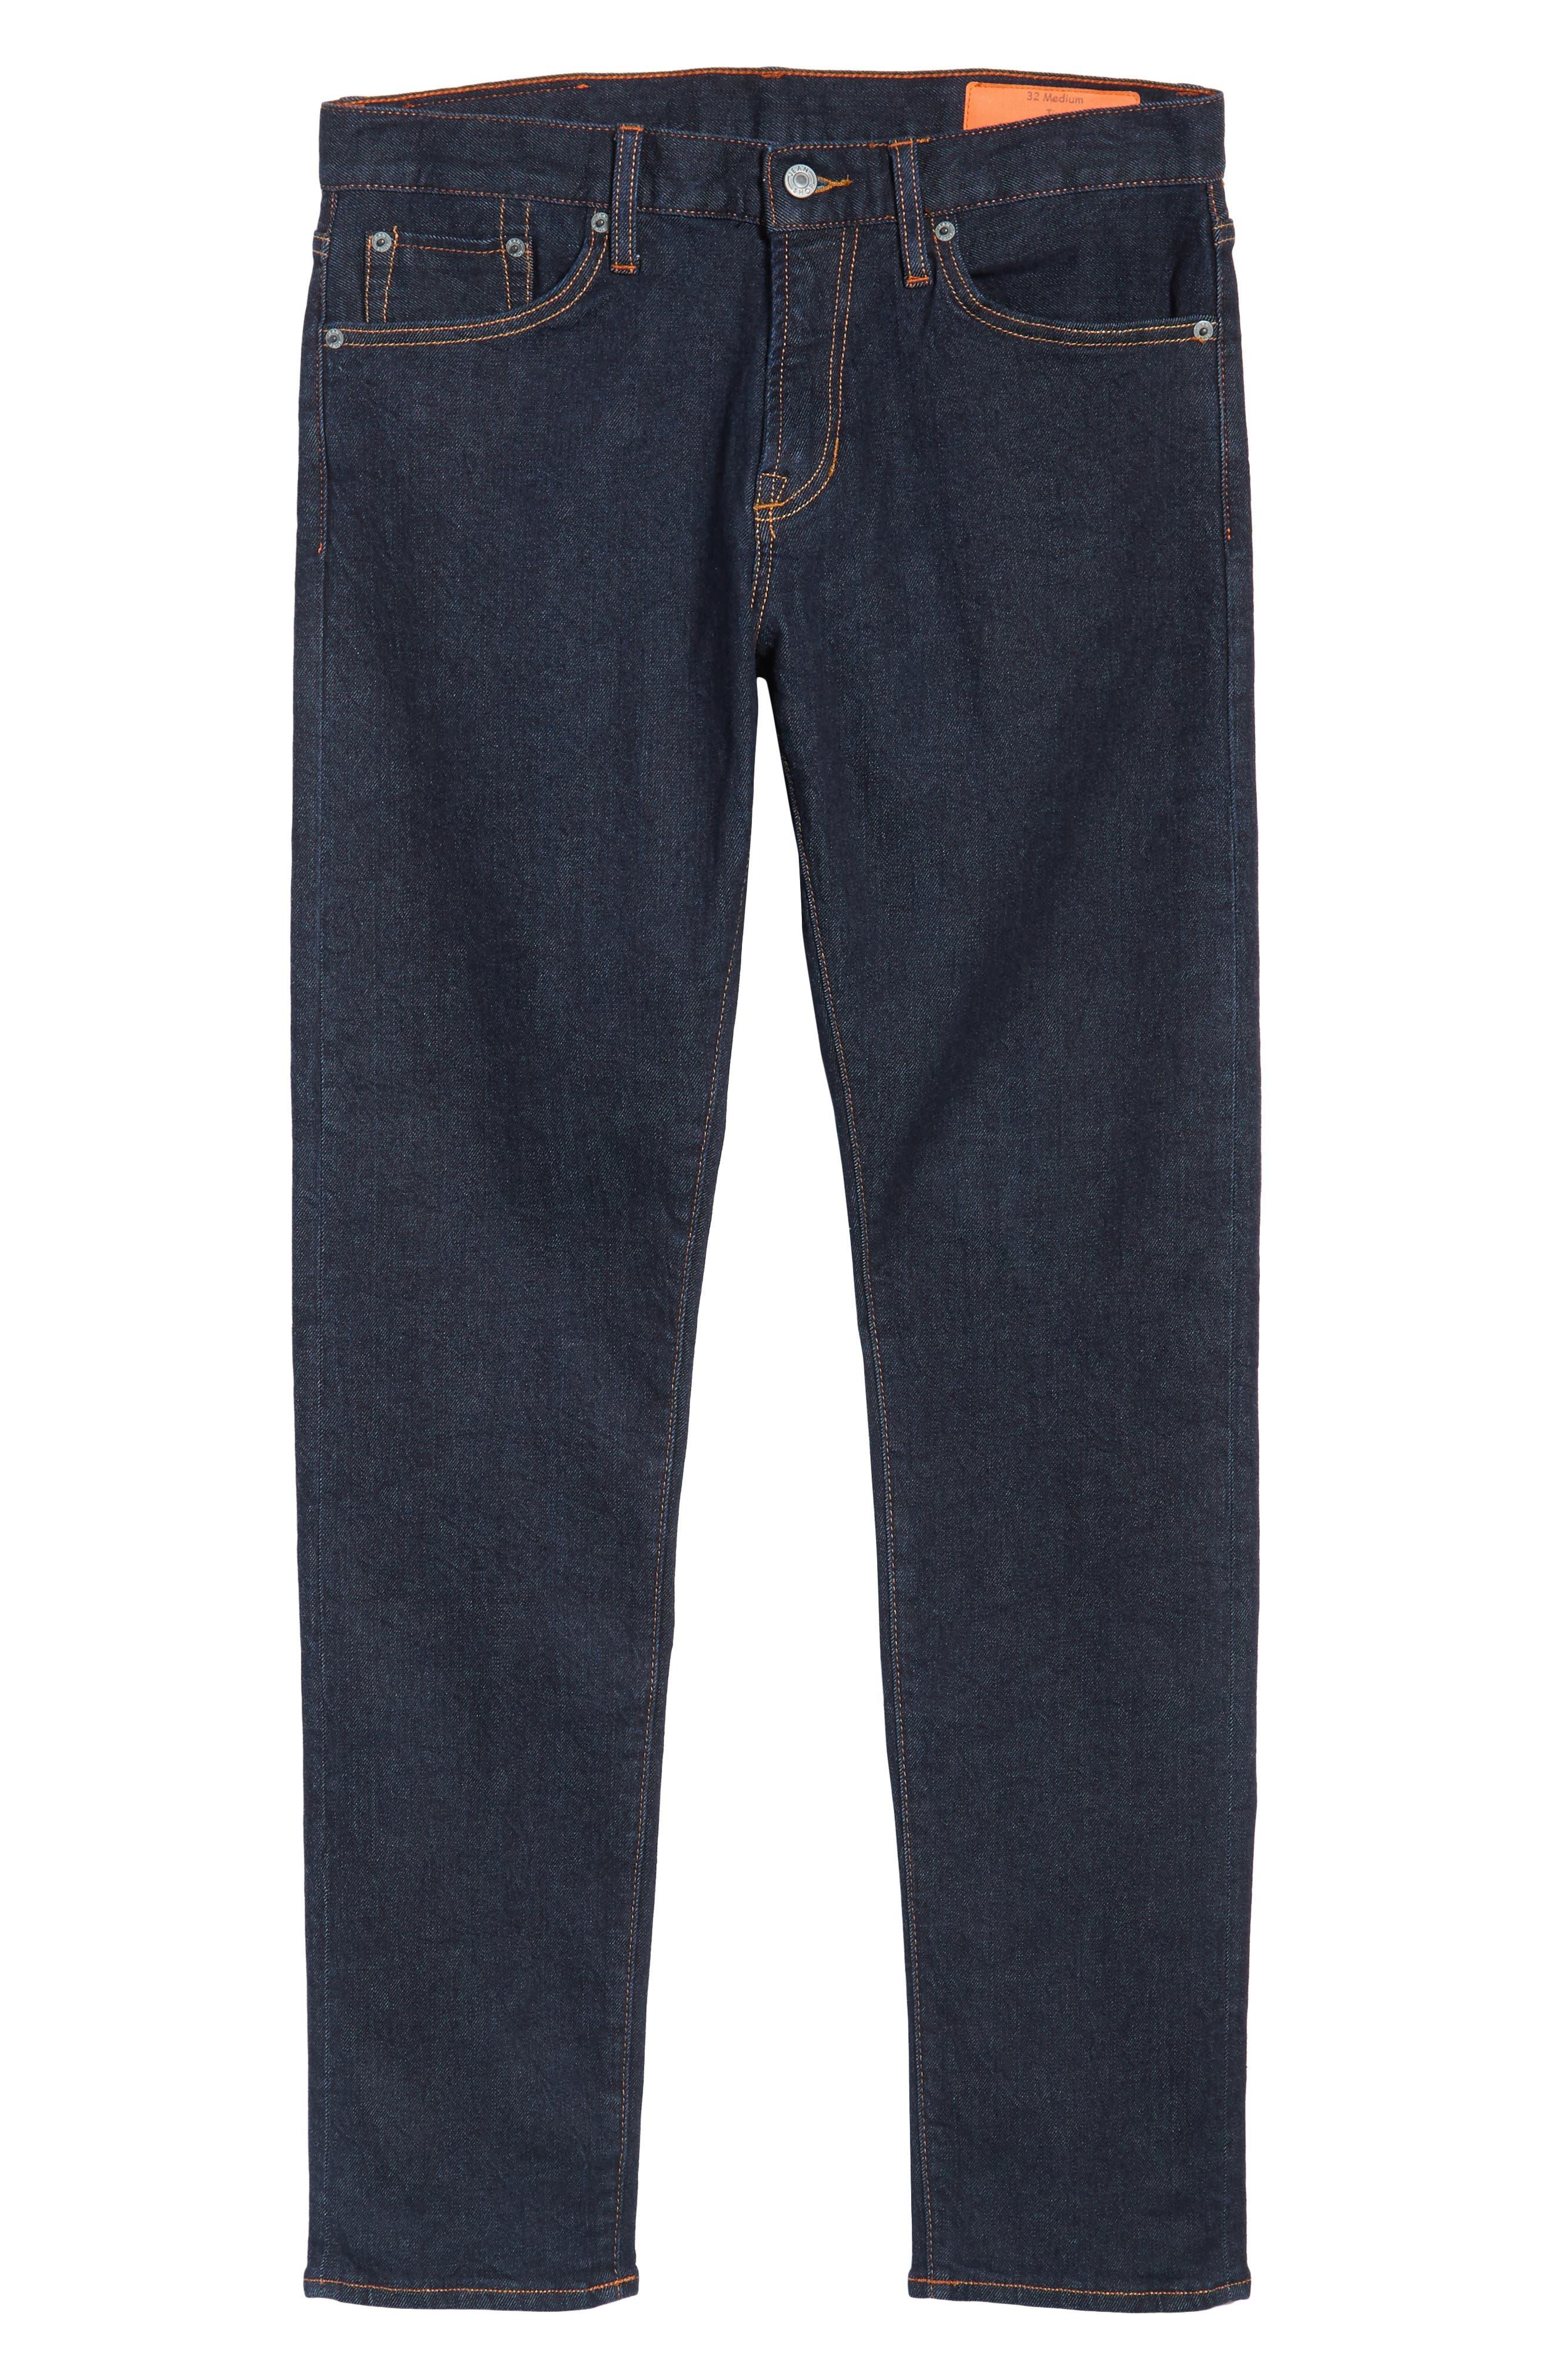 Jim Slim Fit Selvedge Jeans,                             Alternate thumbnail 6, color,                             460